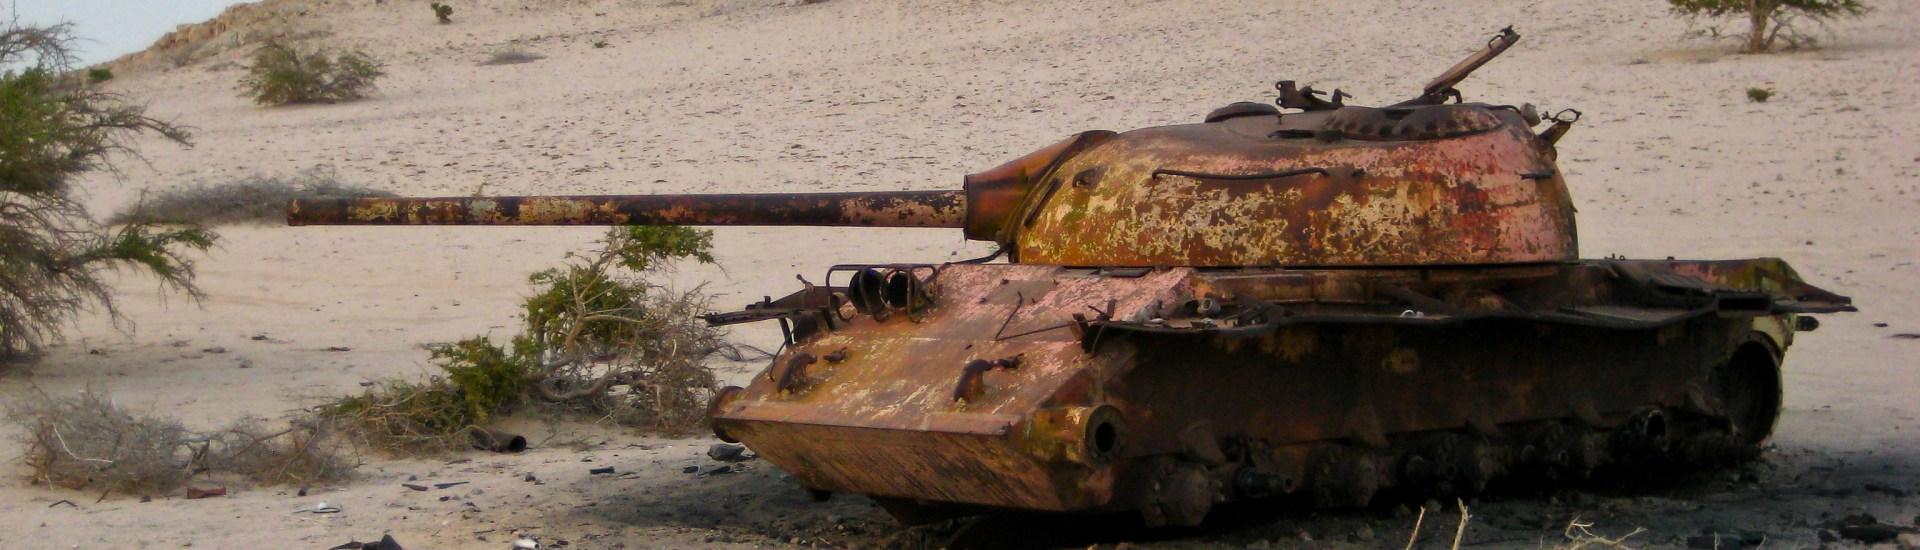 Somalia Tank Somaliland Hargeisa 2008